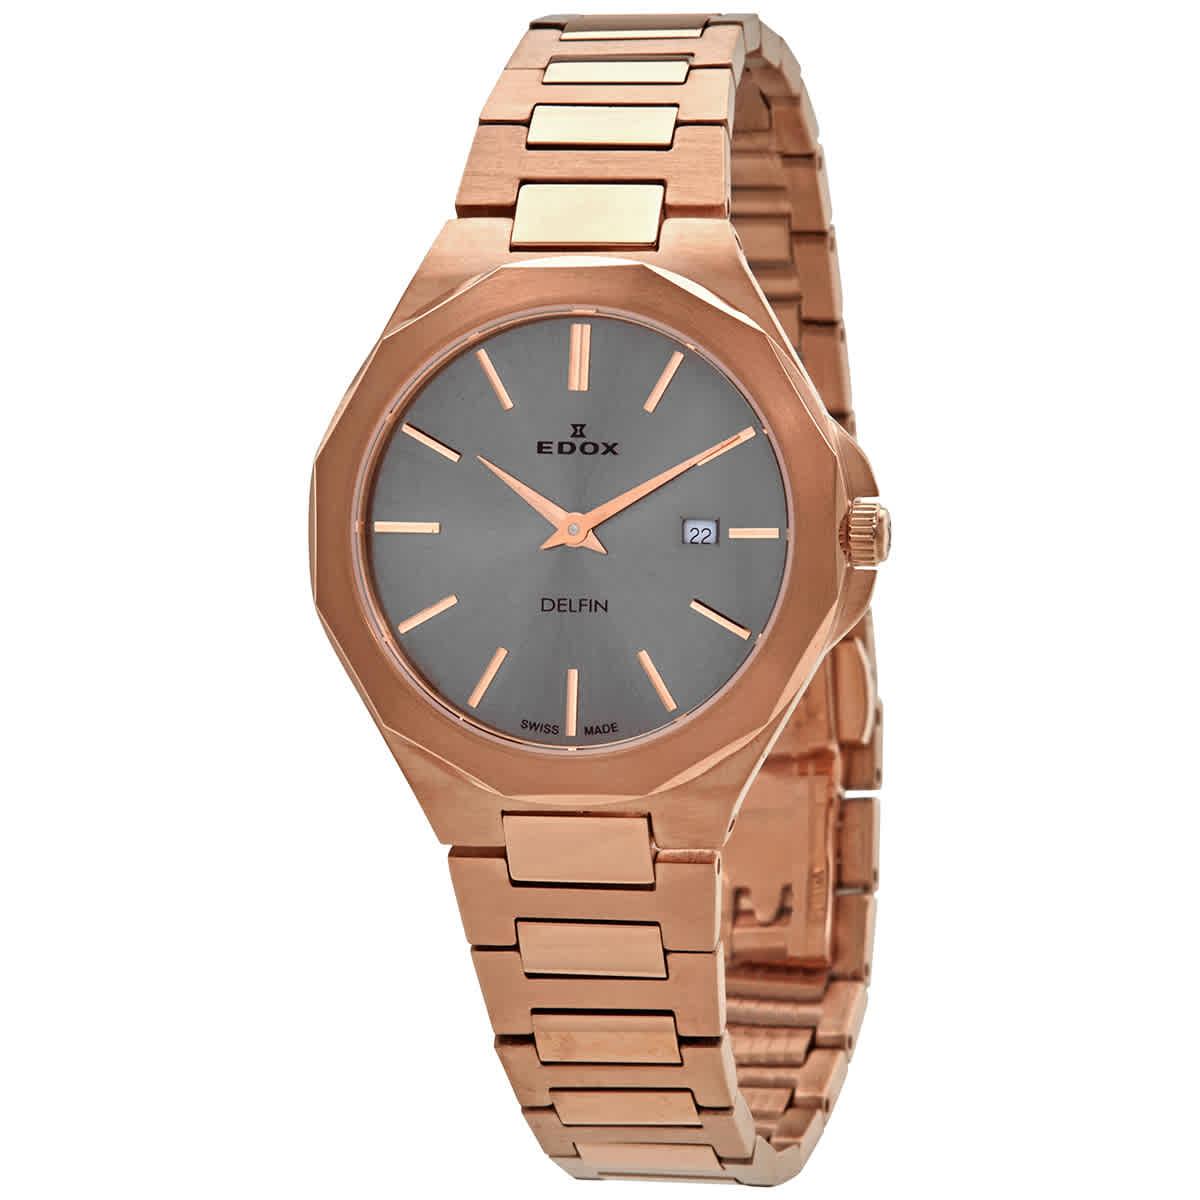 Edox Delfin Quartz Grey Dial Ladies Watch 57005 37rm Gir In Gold